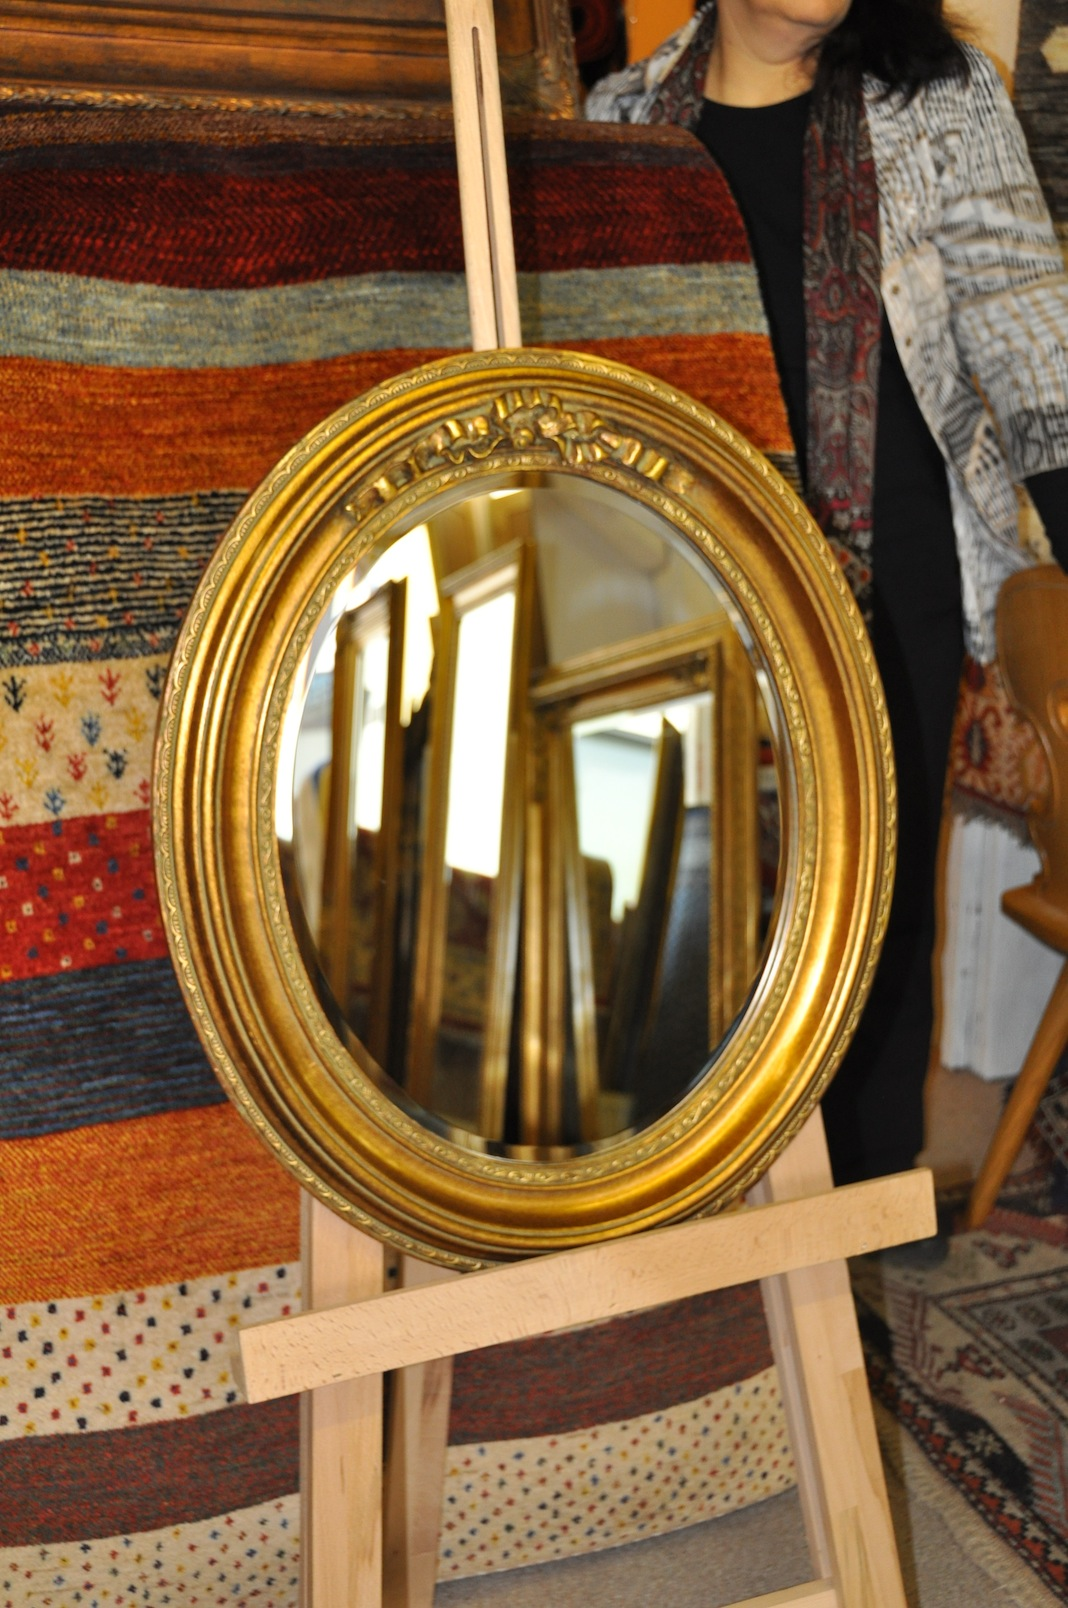 wandspiegel oval 55 65 cm gold zierspiegel prunk barock ebay. Black Bedroom Furniture Sets. Home Design Ideas